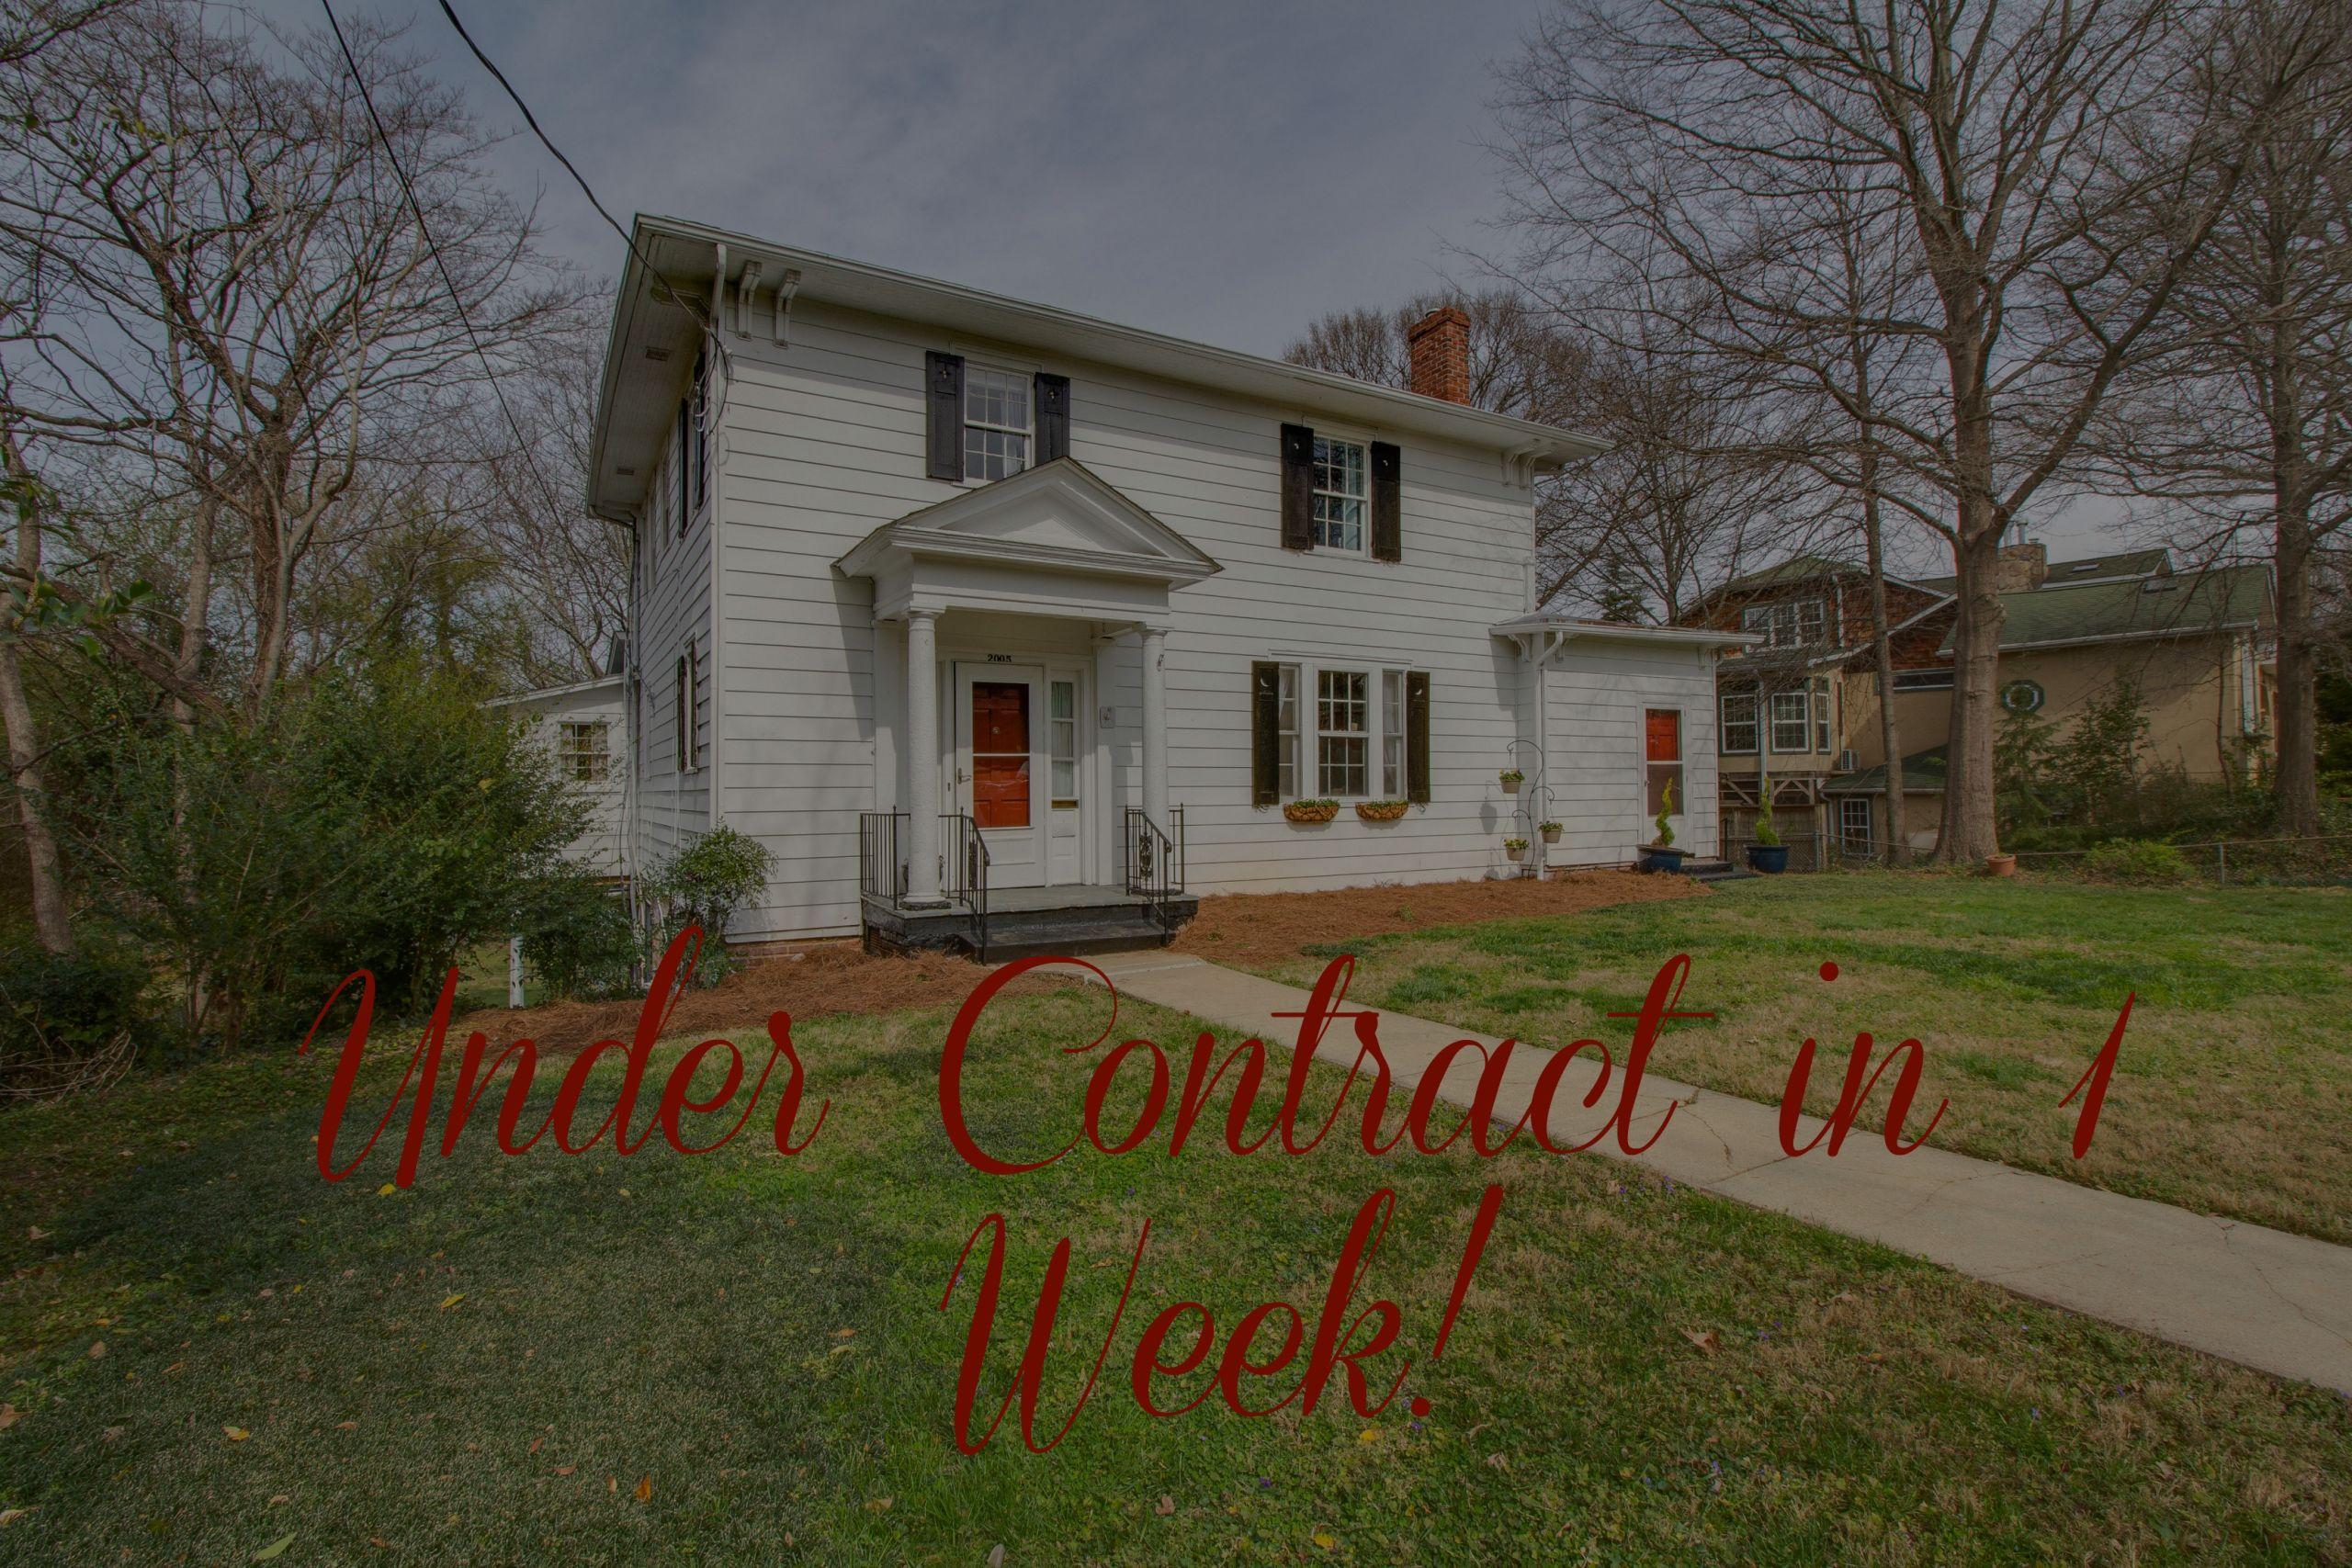 UNDER CONTRACT in 1 WEEK!